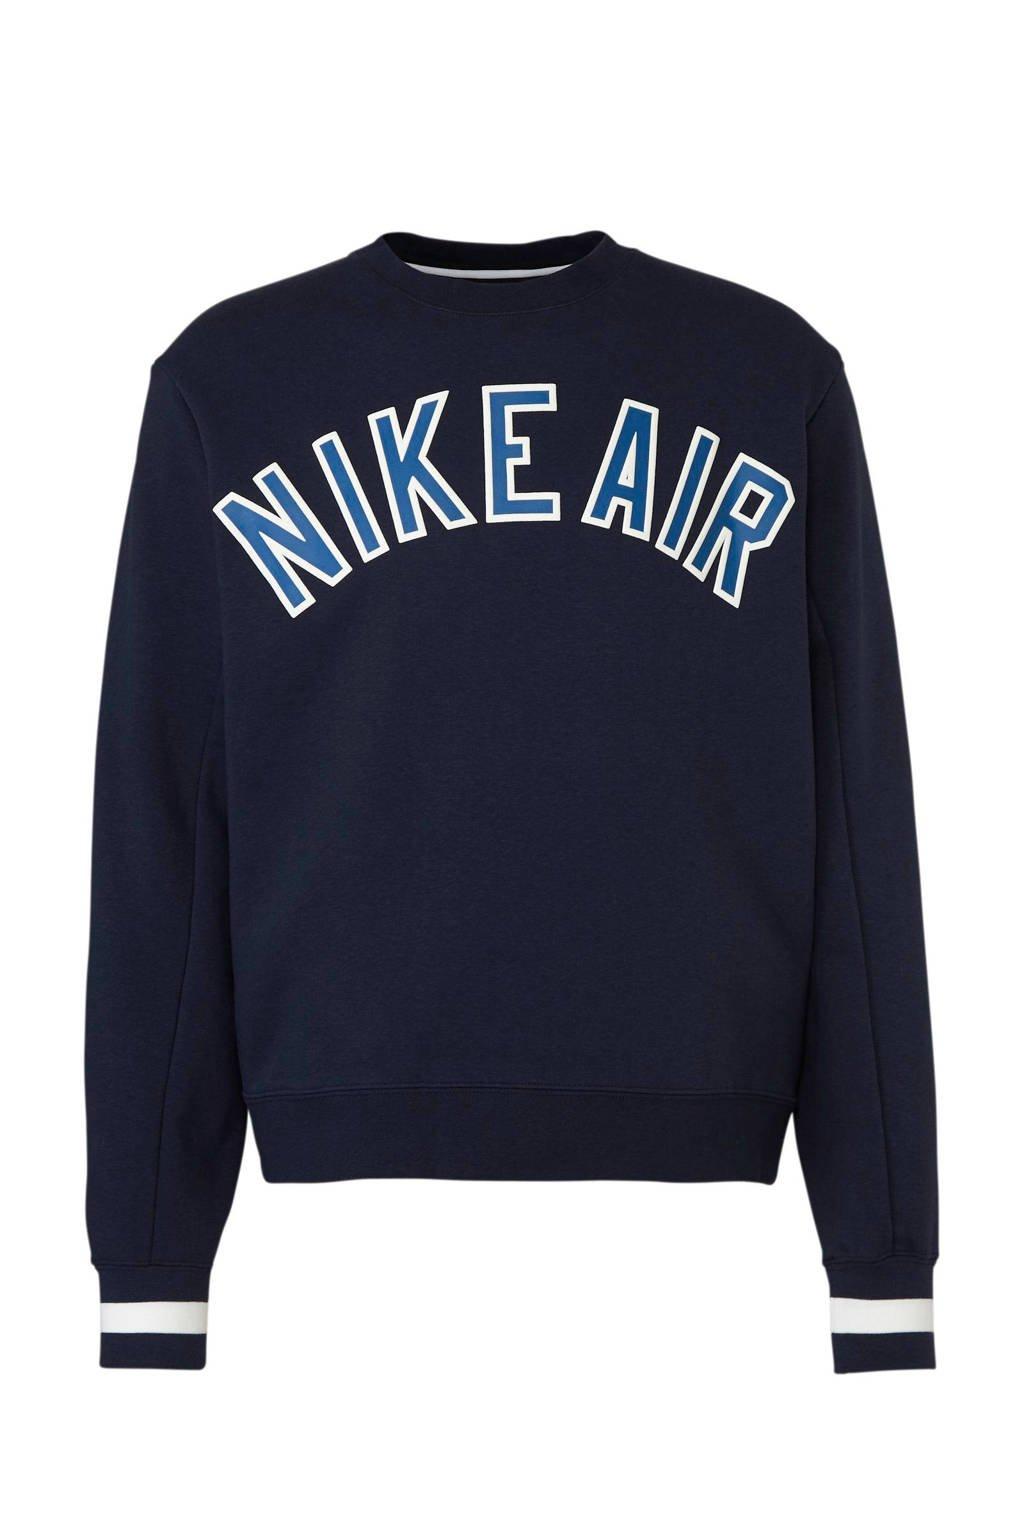 Nike   sportsweater met printopdruk donkerblauw, Donkerblauw